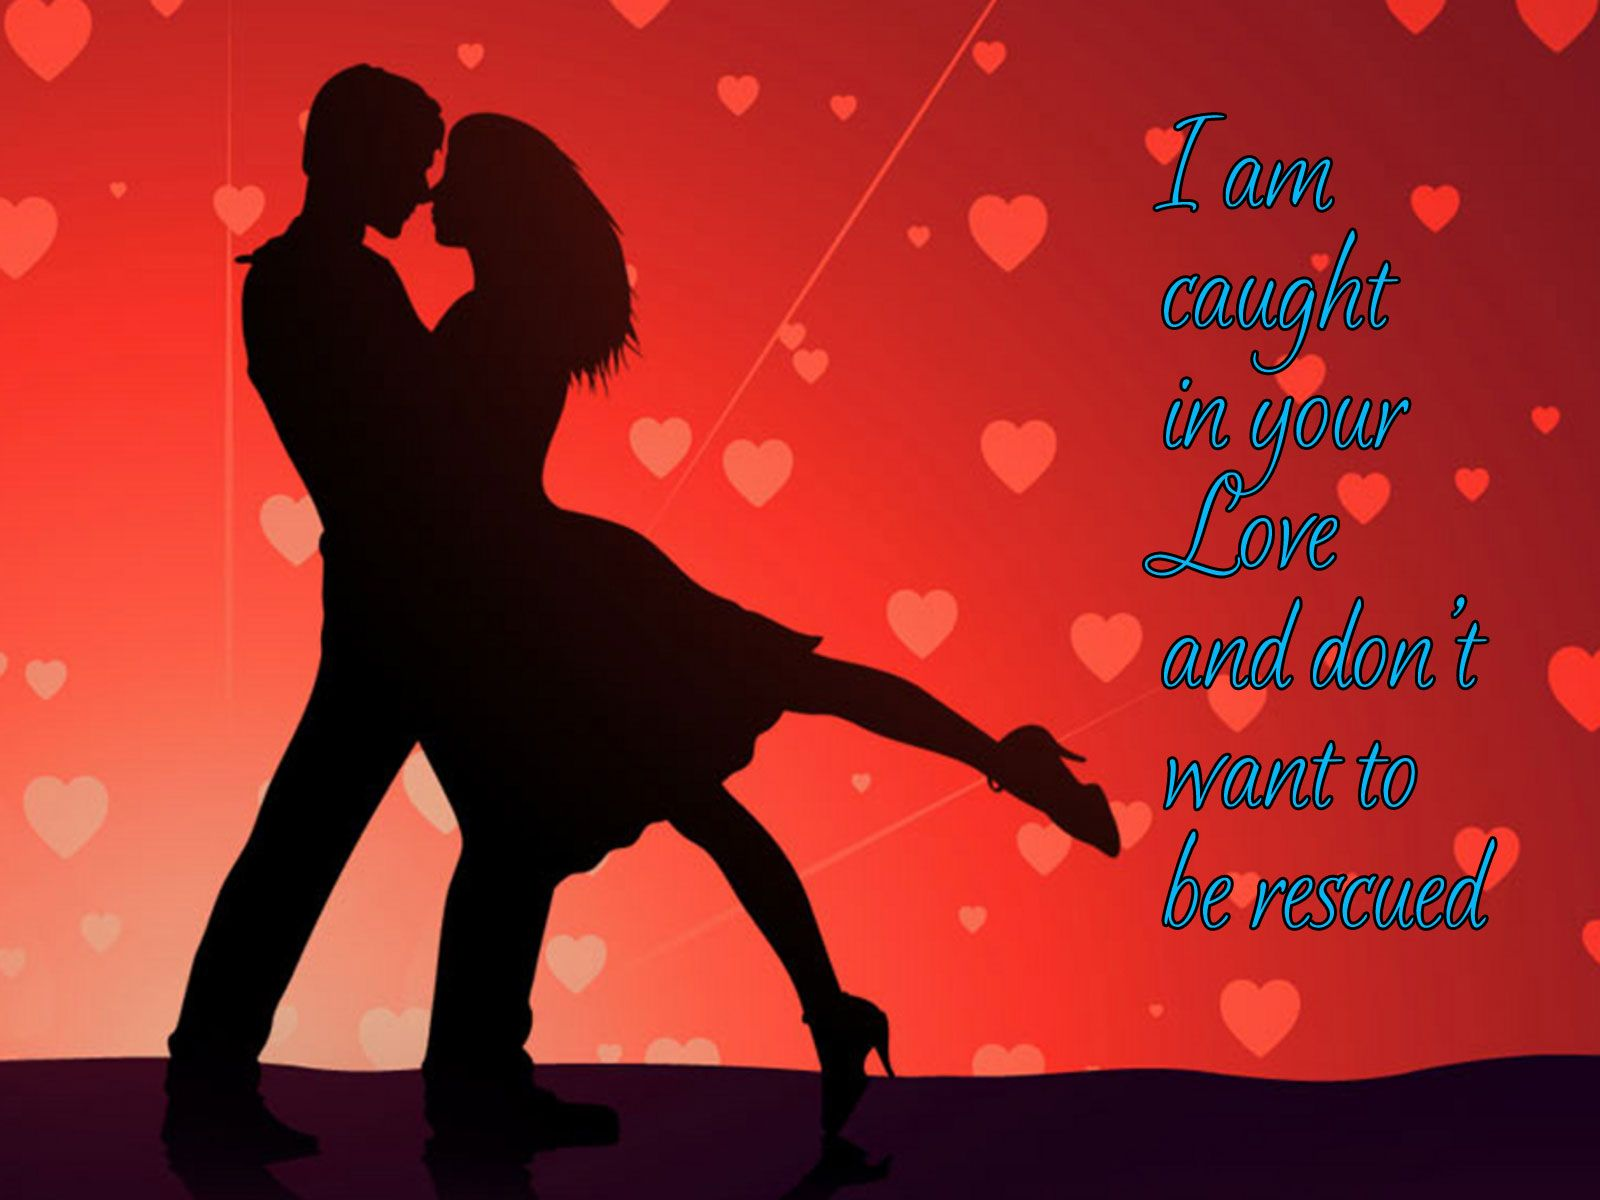 Romantic Love Wallpapers DesignBump